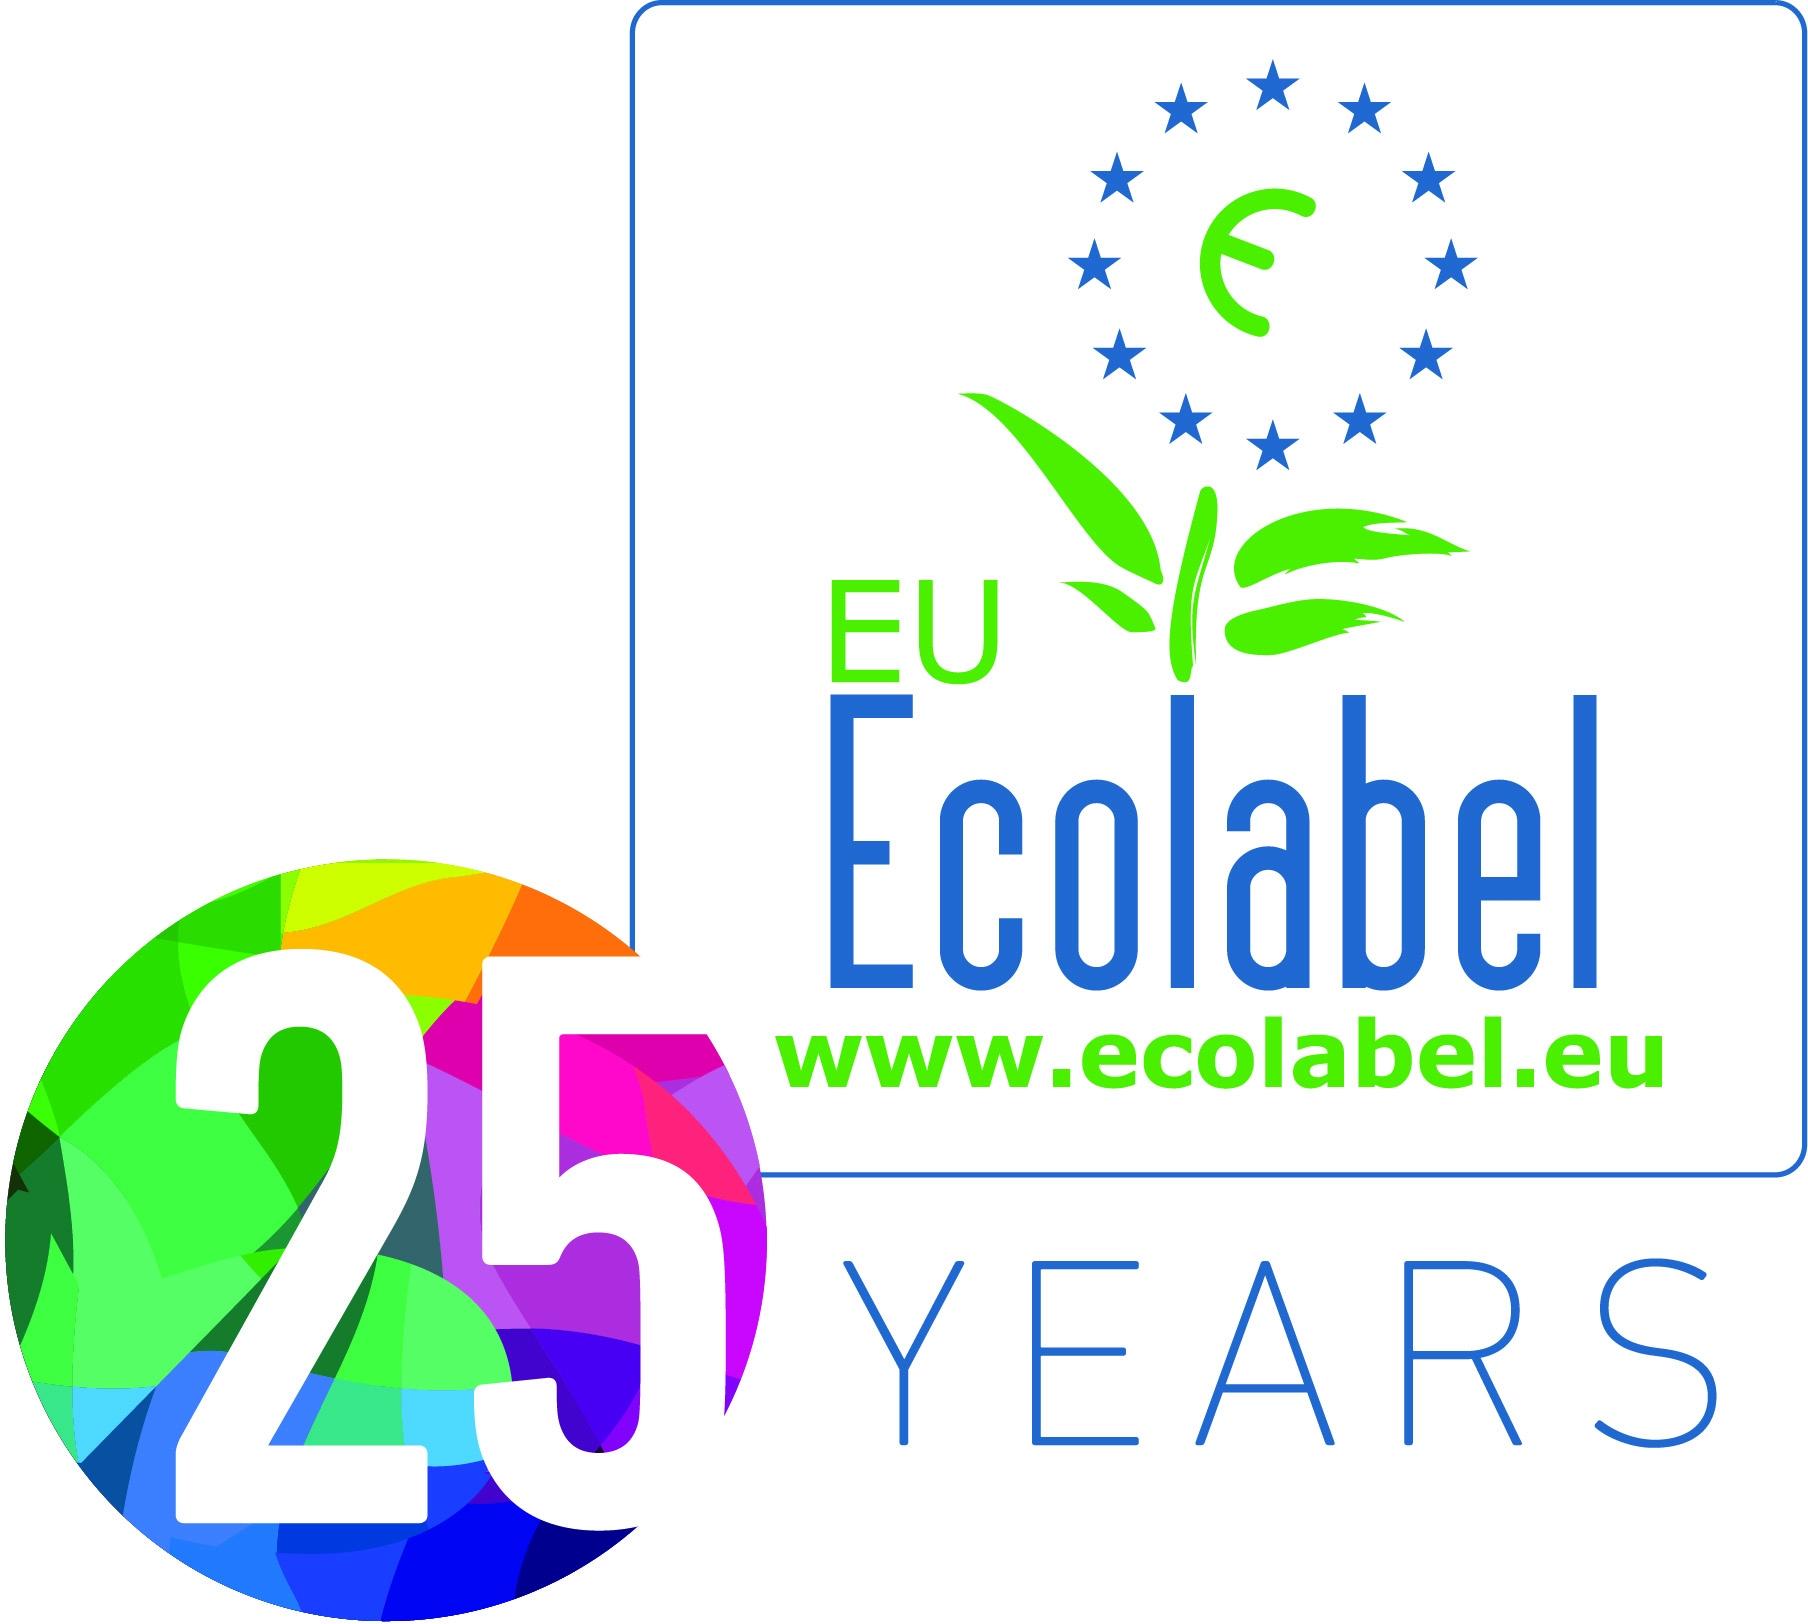 logo ecolabel-2